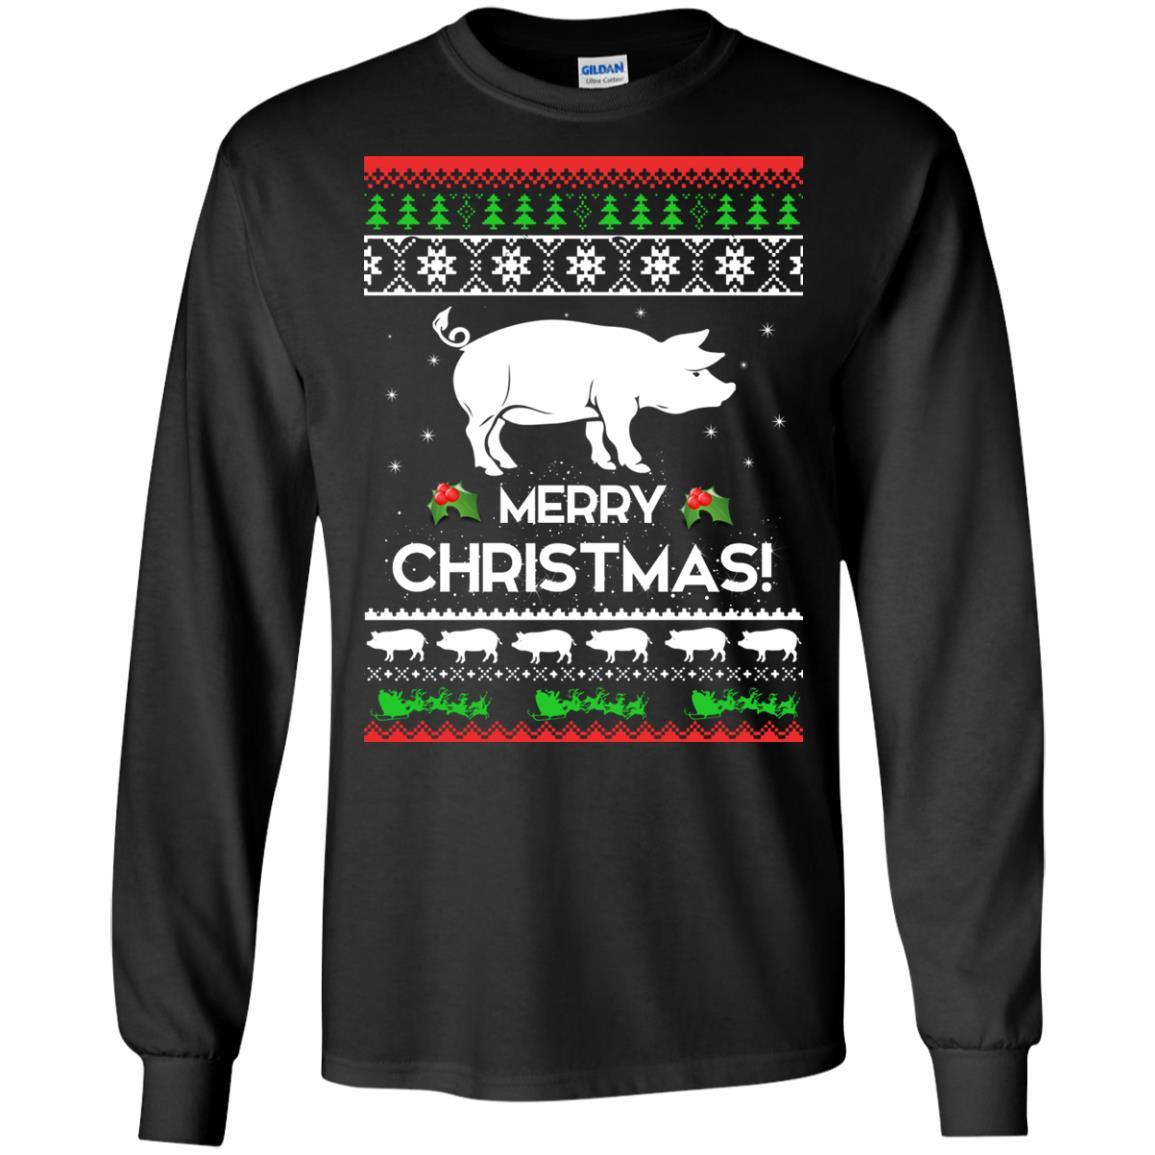 image 3872 - Merry Pigmas Christmas Pig Ugly Sweater, Shirt